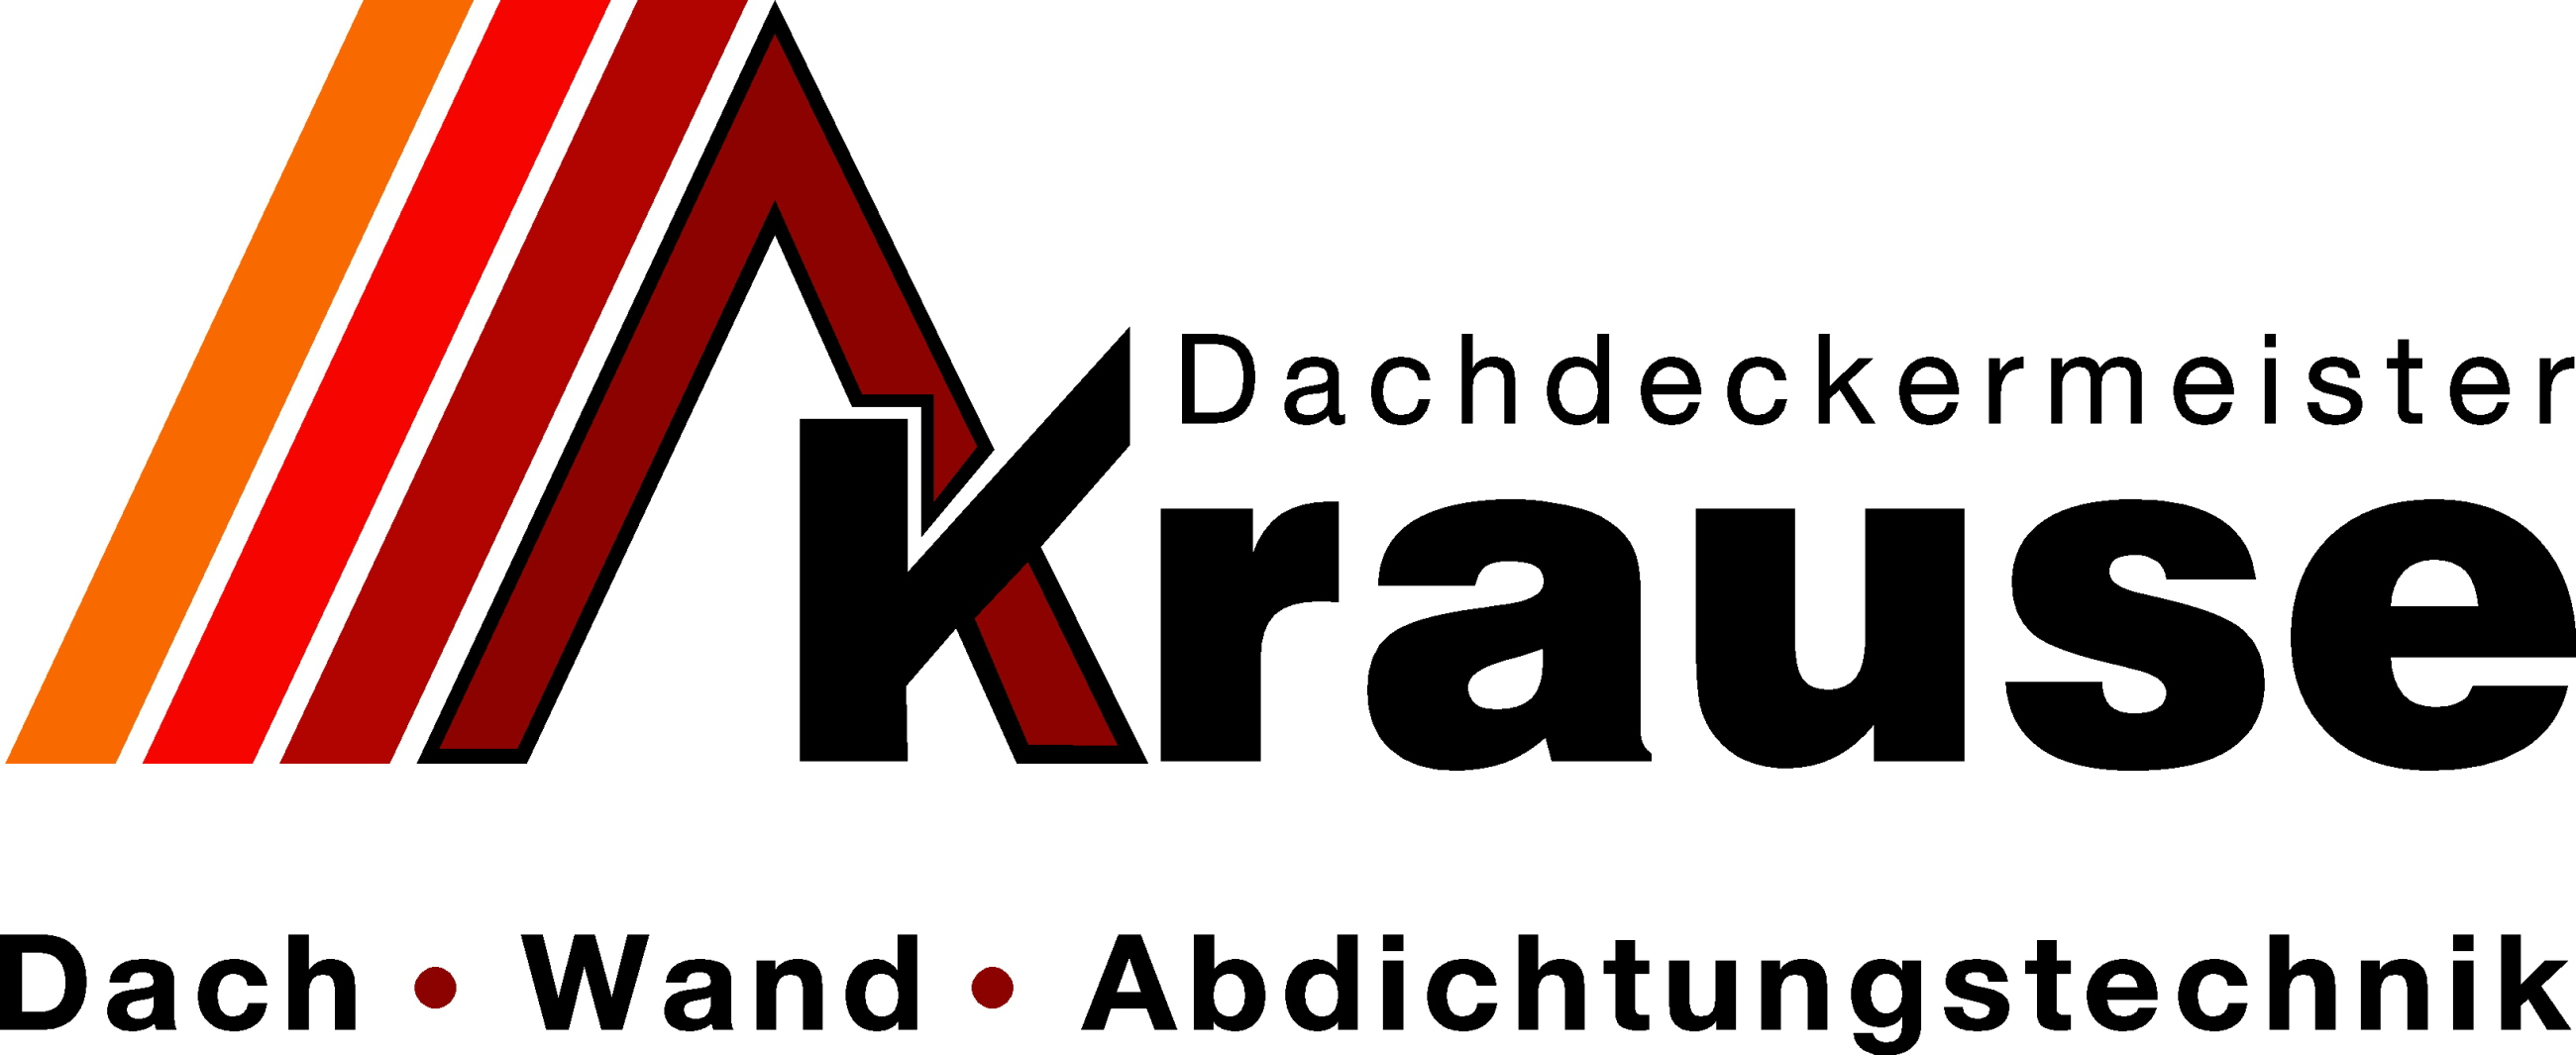 Dachdeckermeister KRAUSE